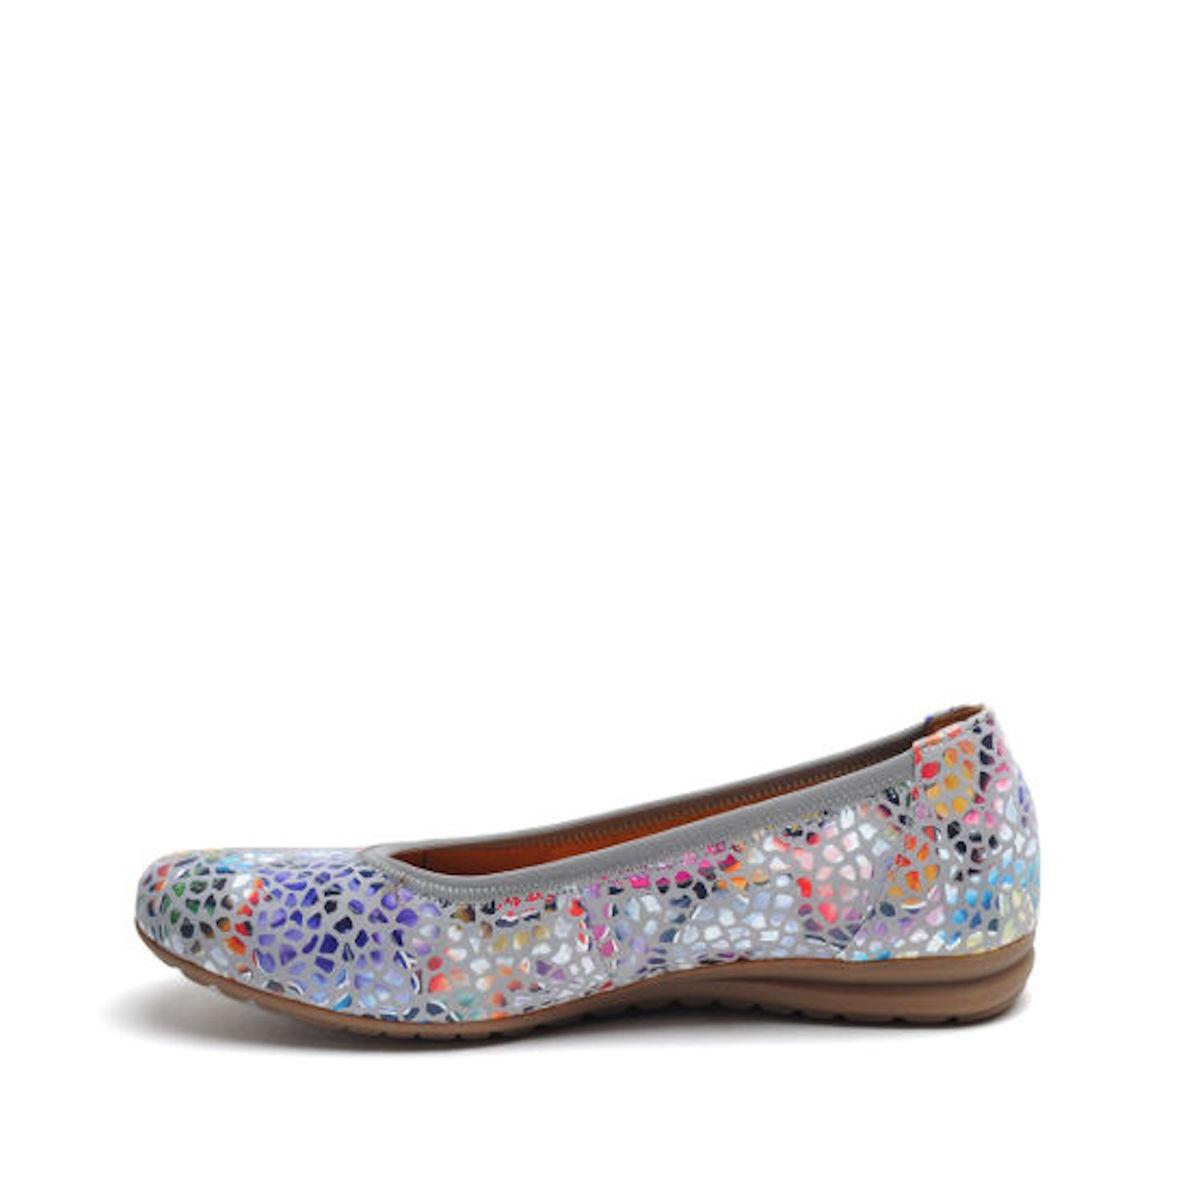 Gabor Splash - Womens Stone / Floral Multi Leather Pump